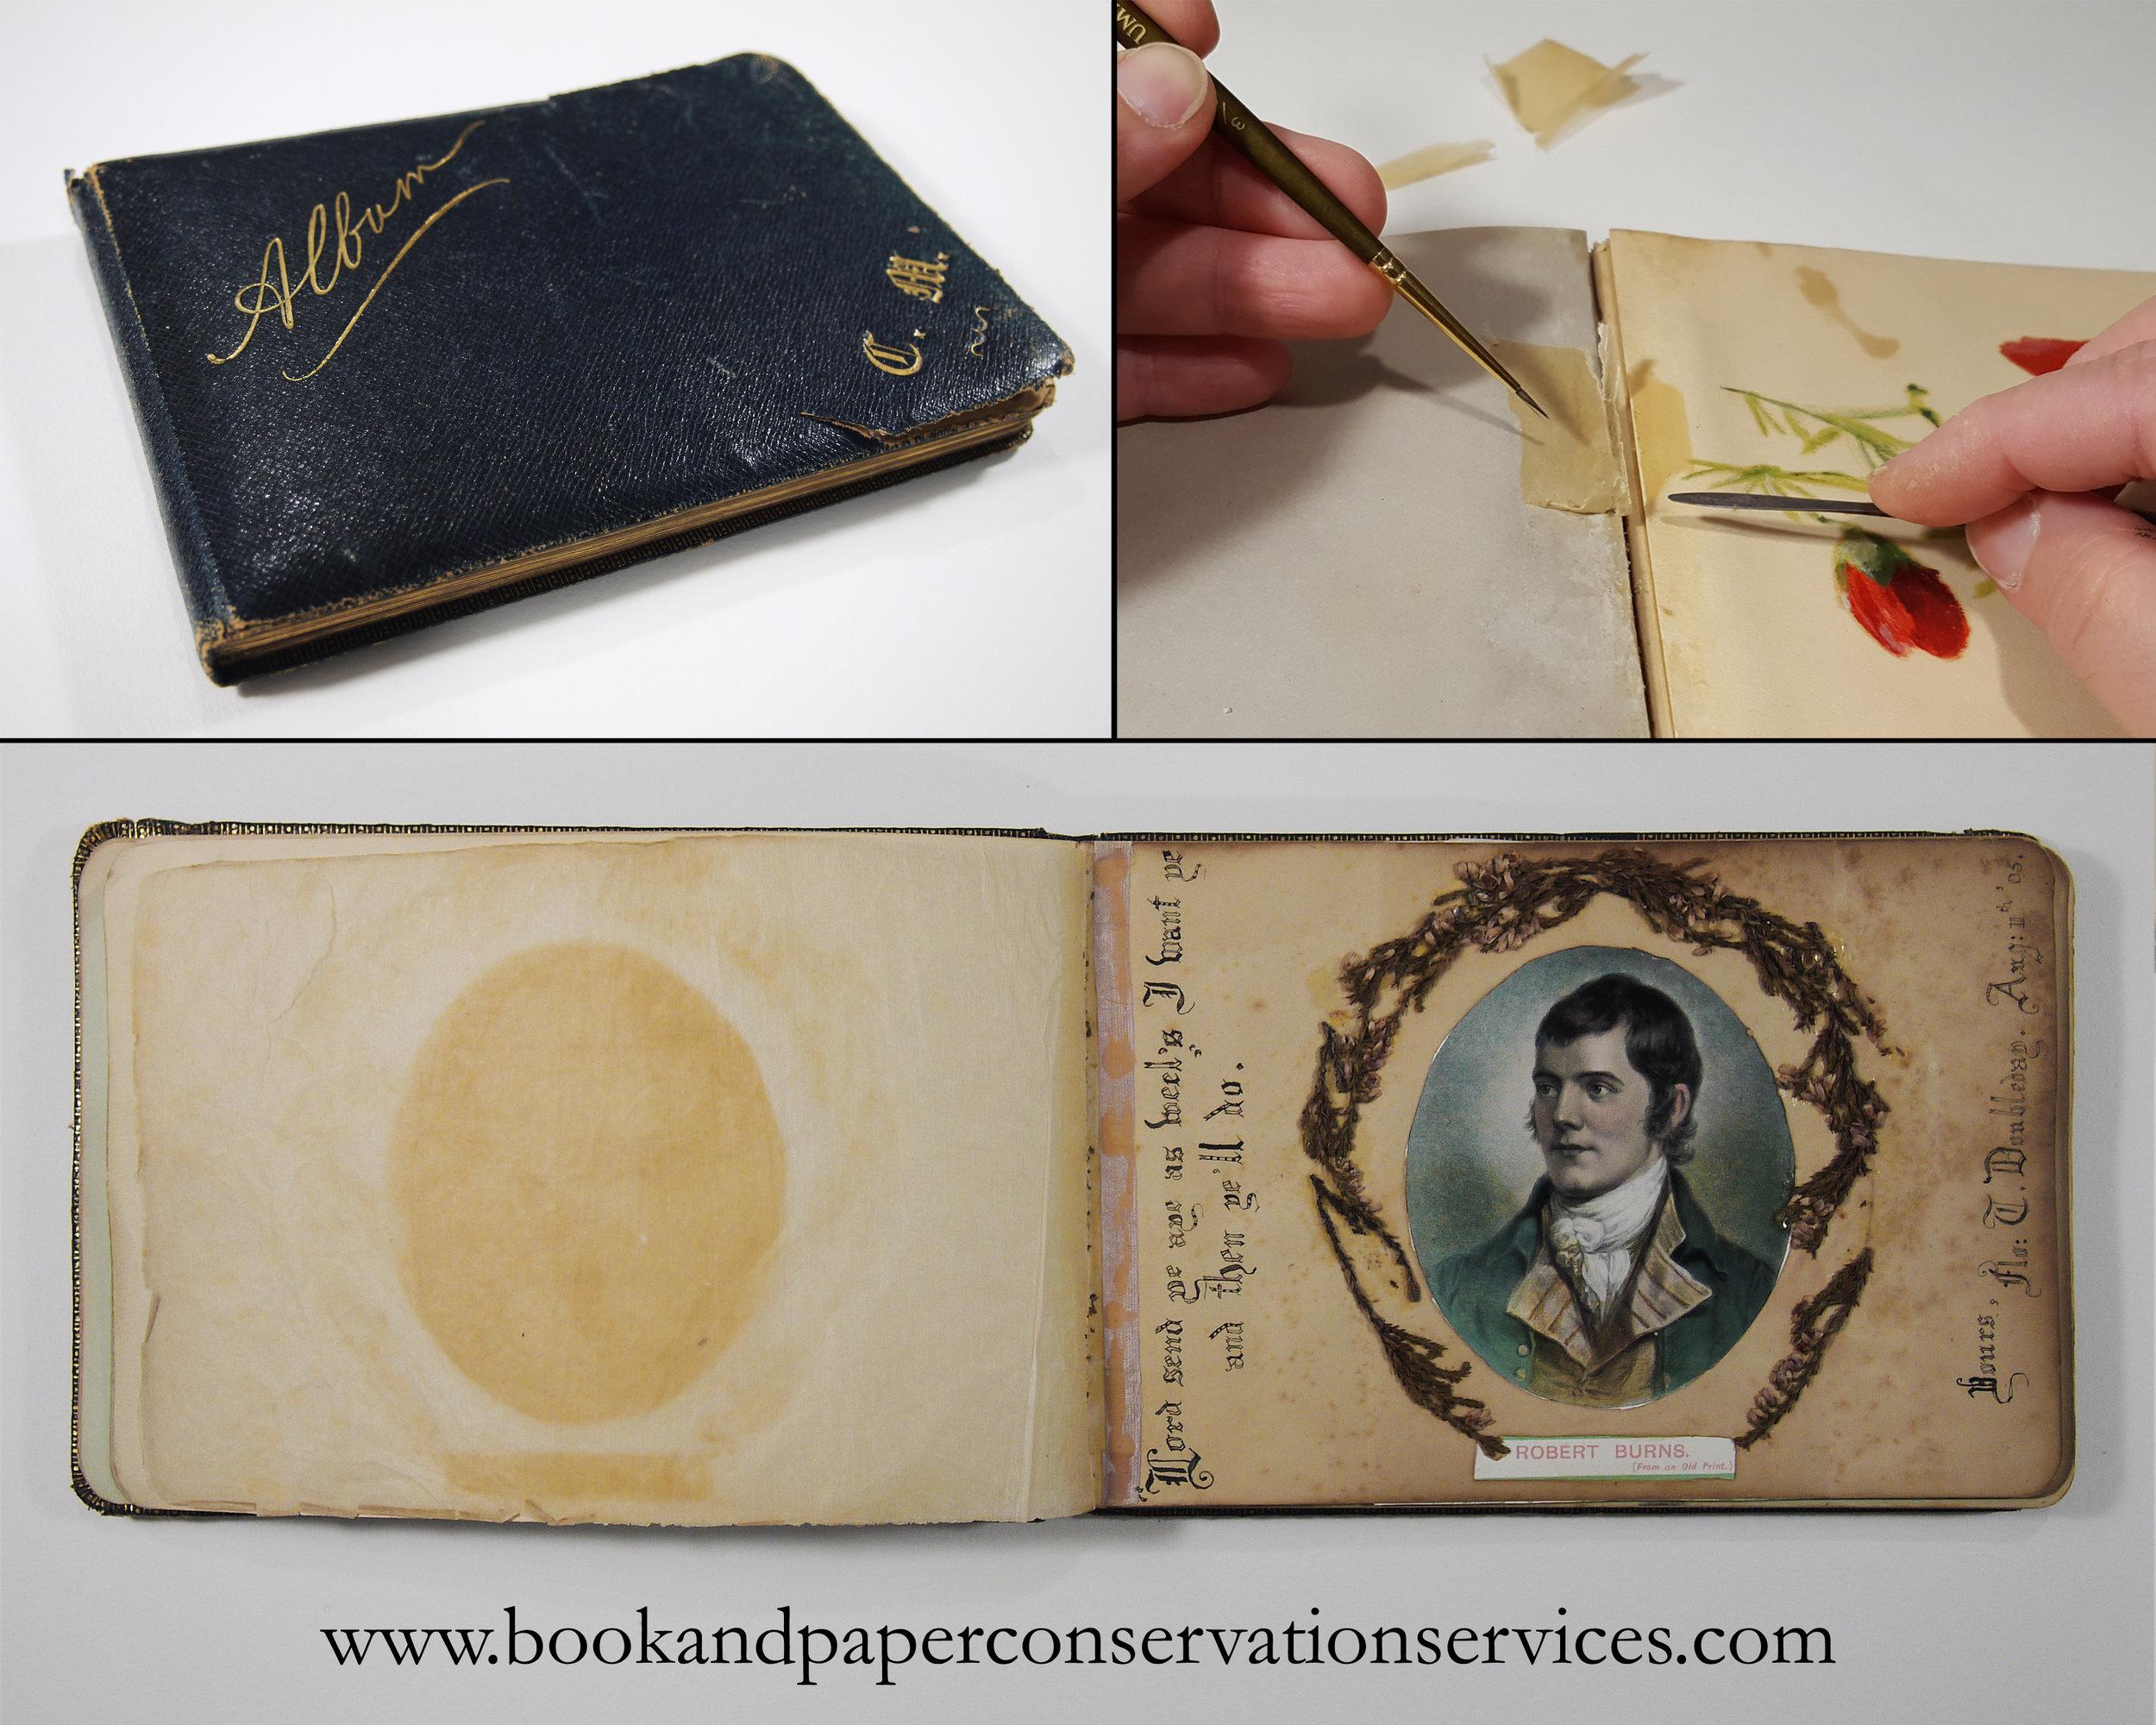 Conservation Treatment of an Antique Keepsake Album